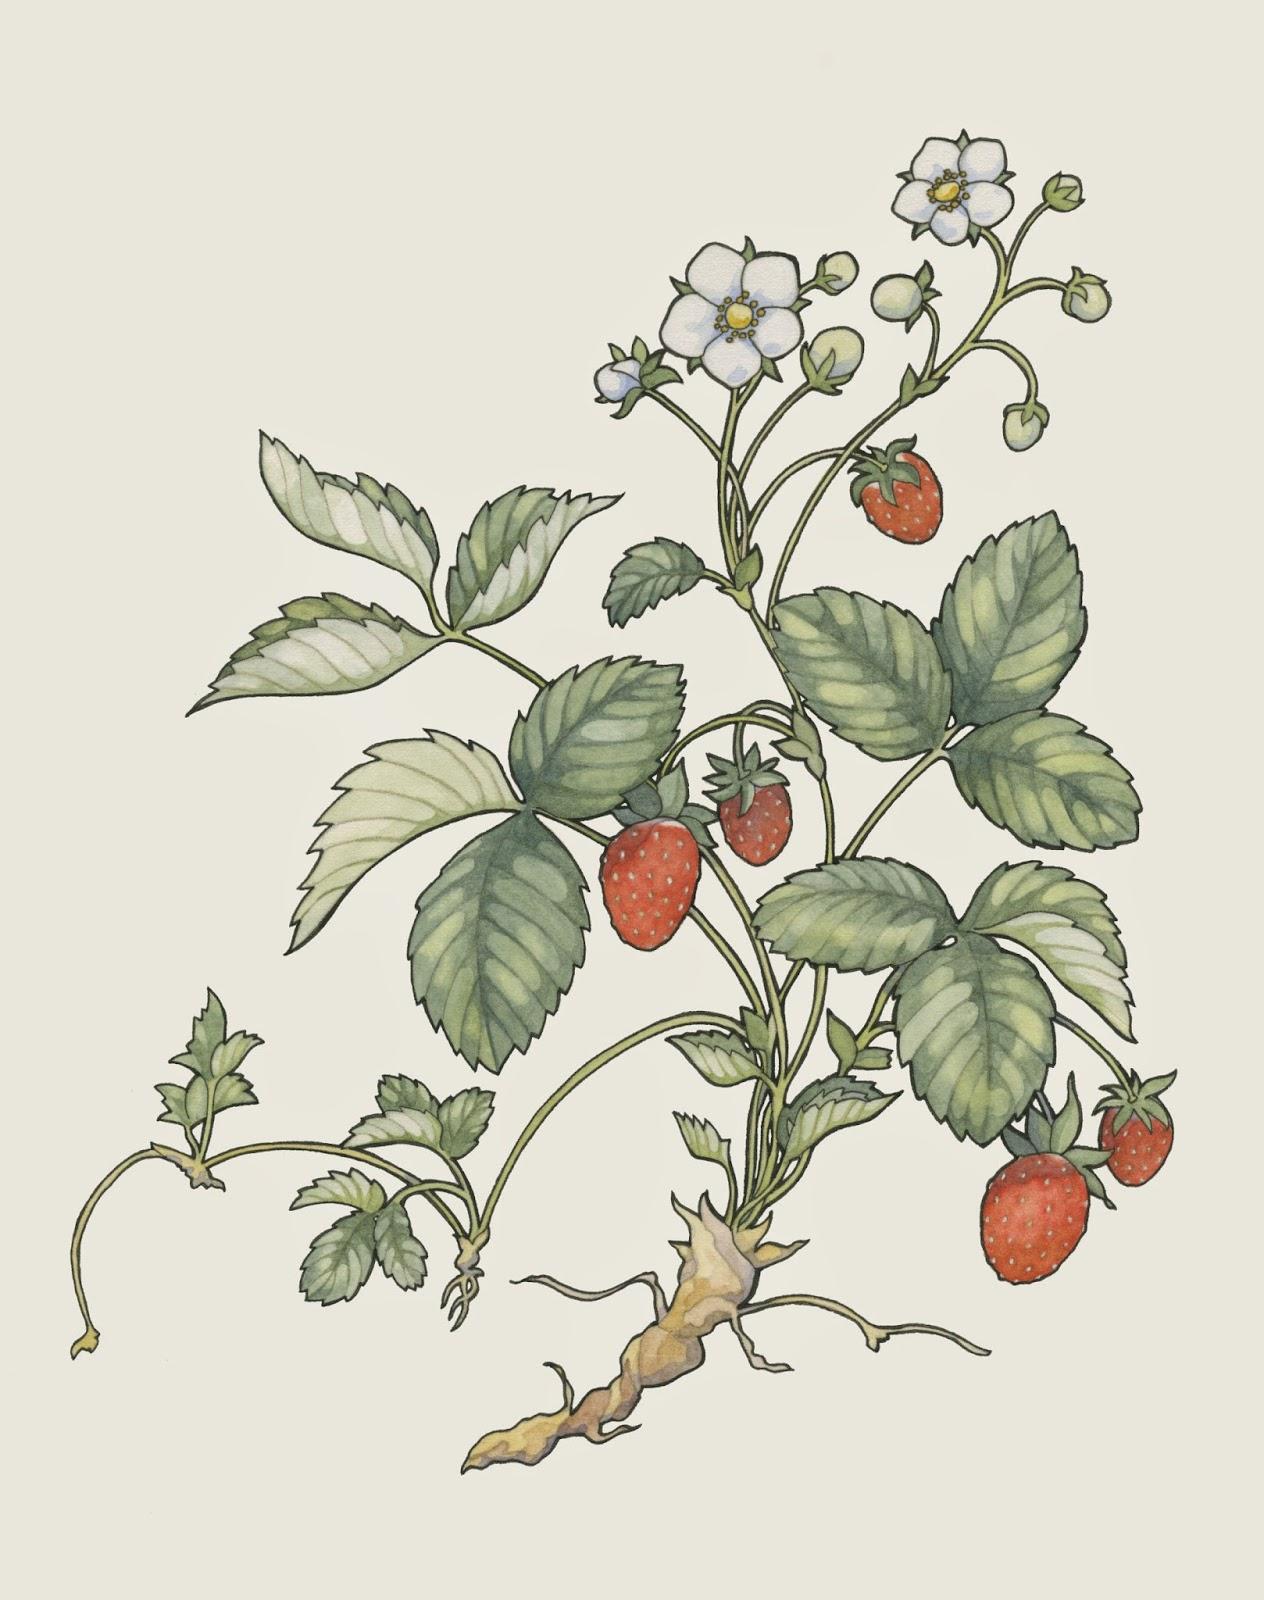 Drawn strawberry strawberry plant #3